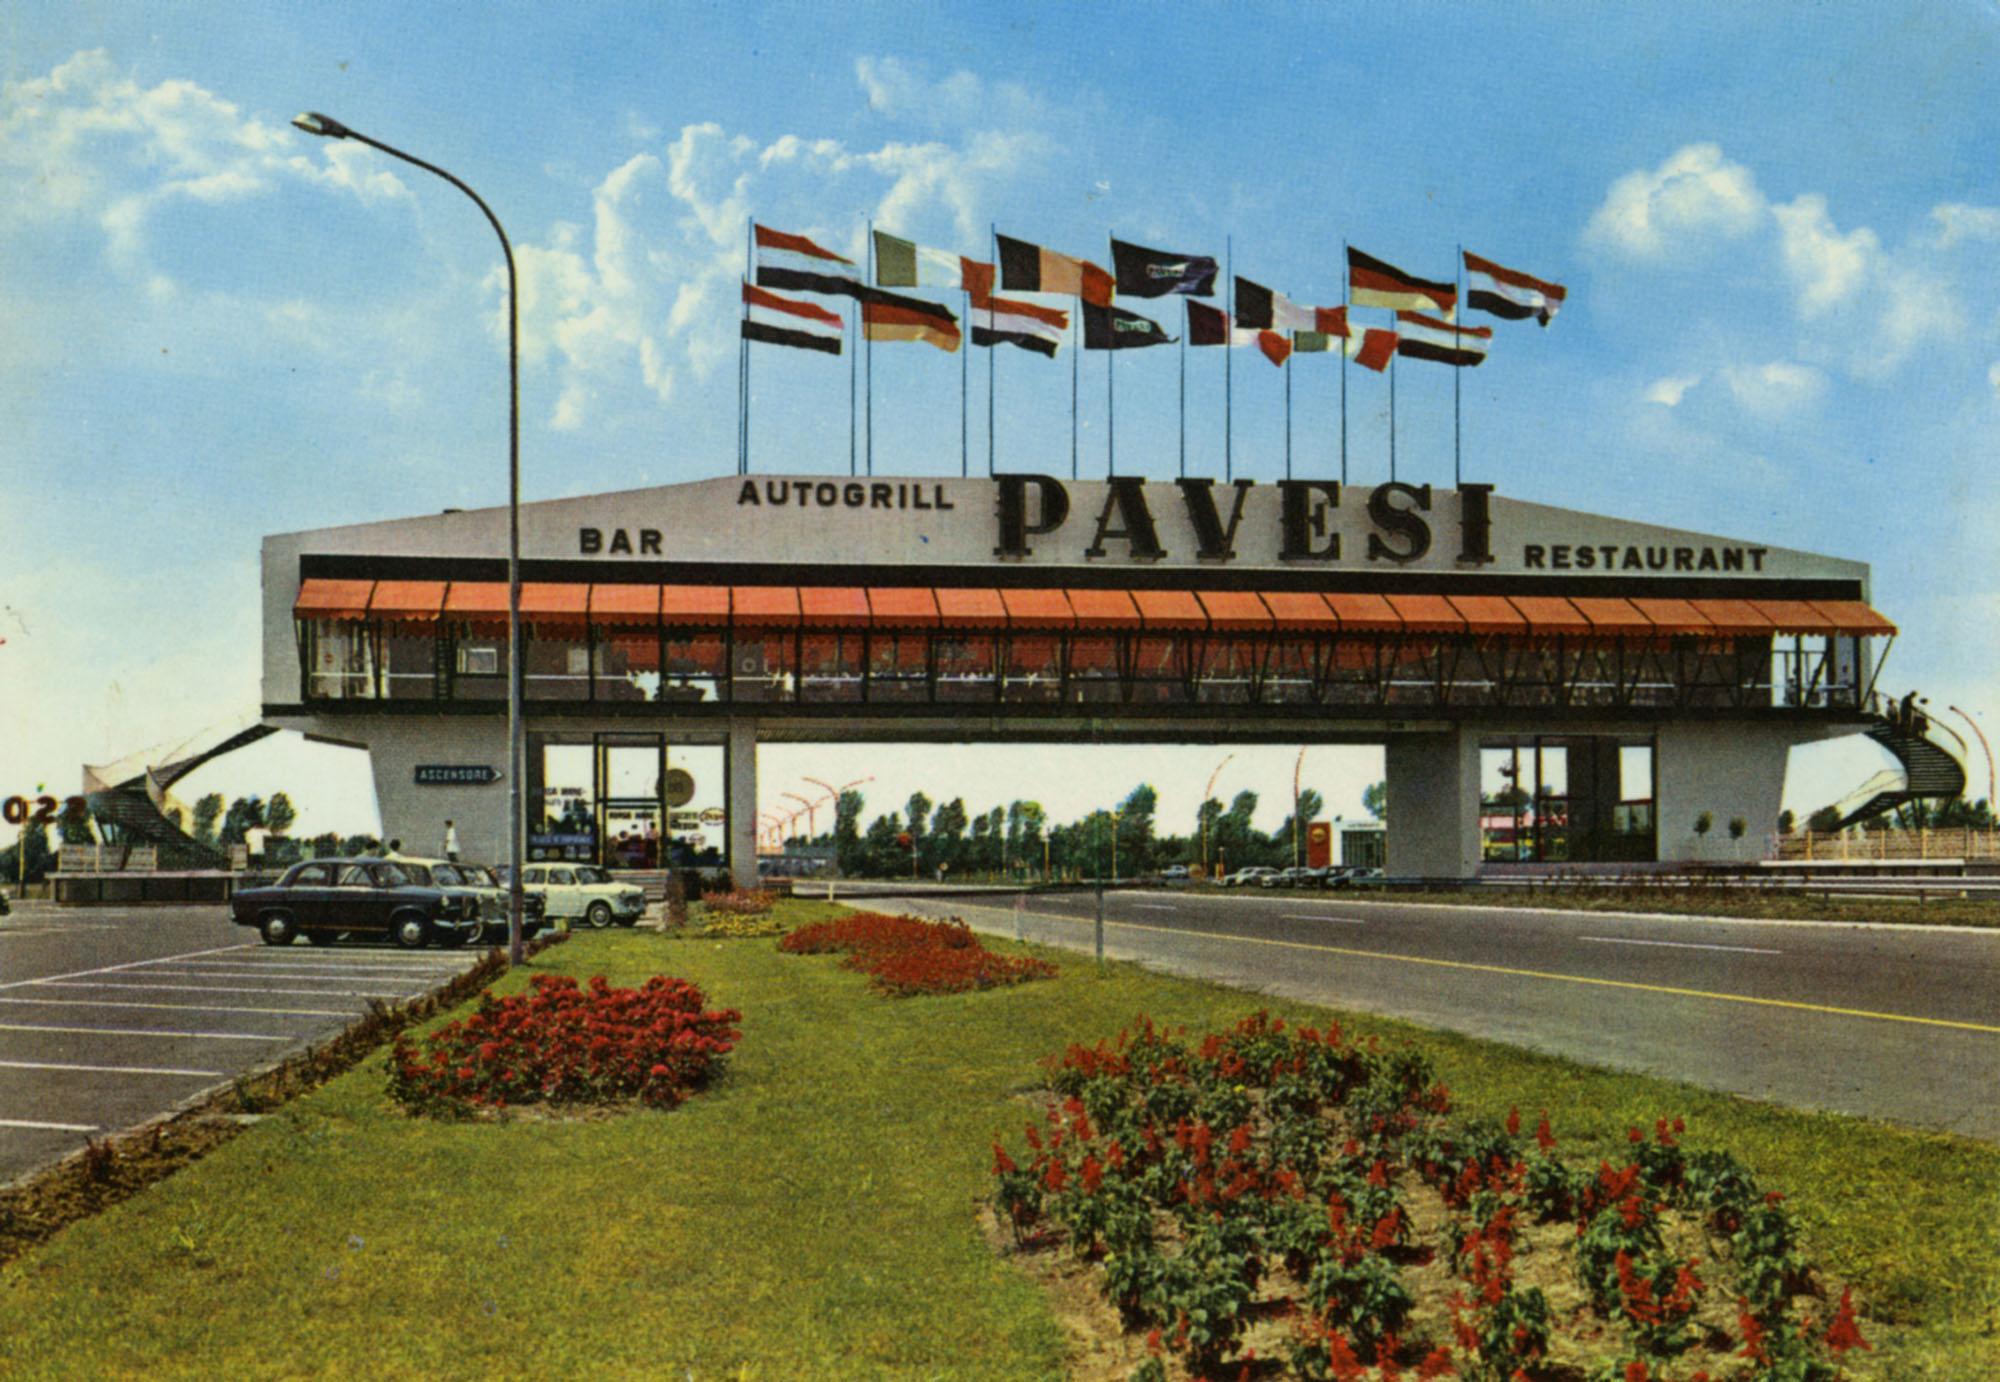 Cartoline Autogrill Pavesi - Fiorenzuola d'Arda